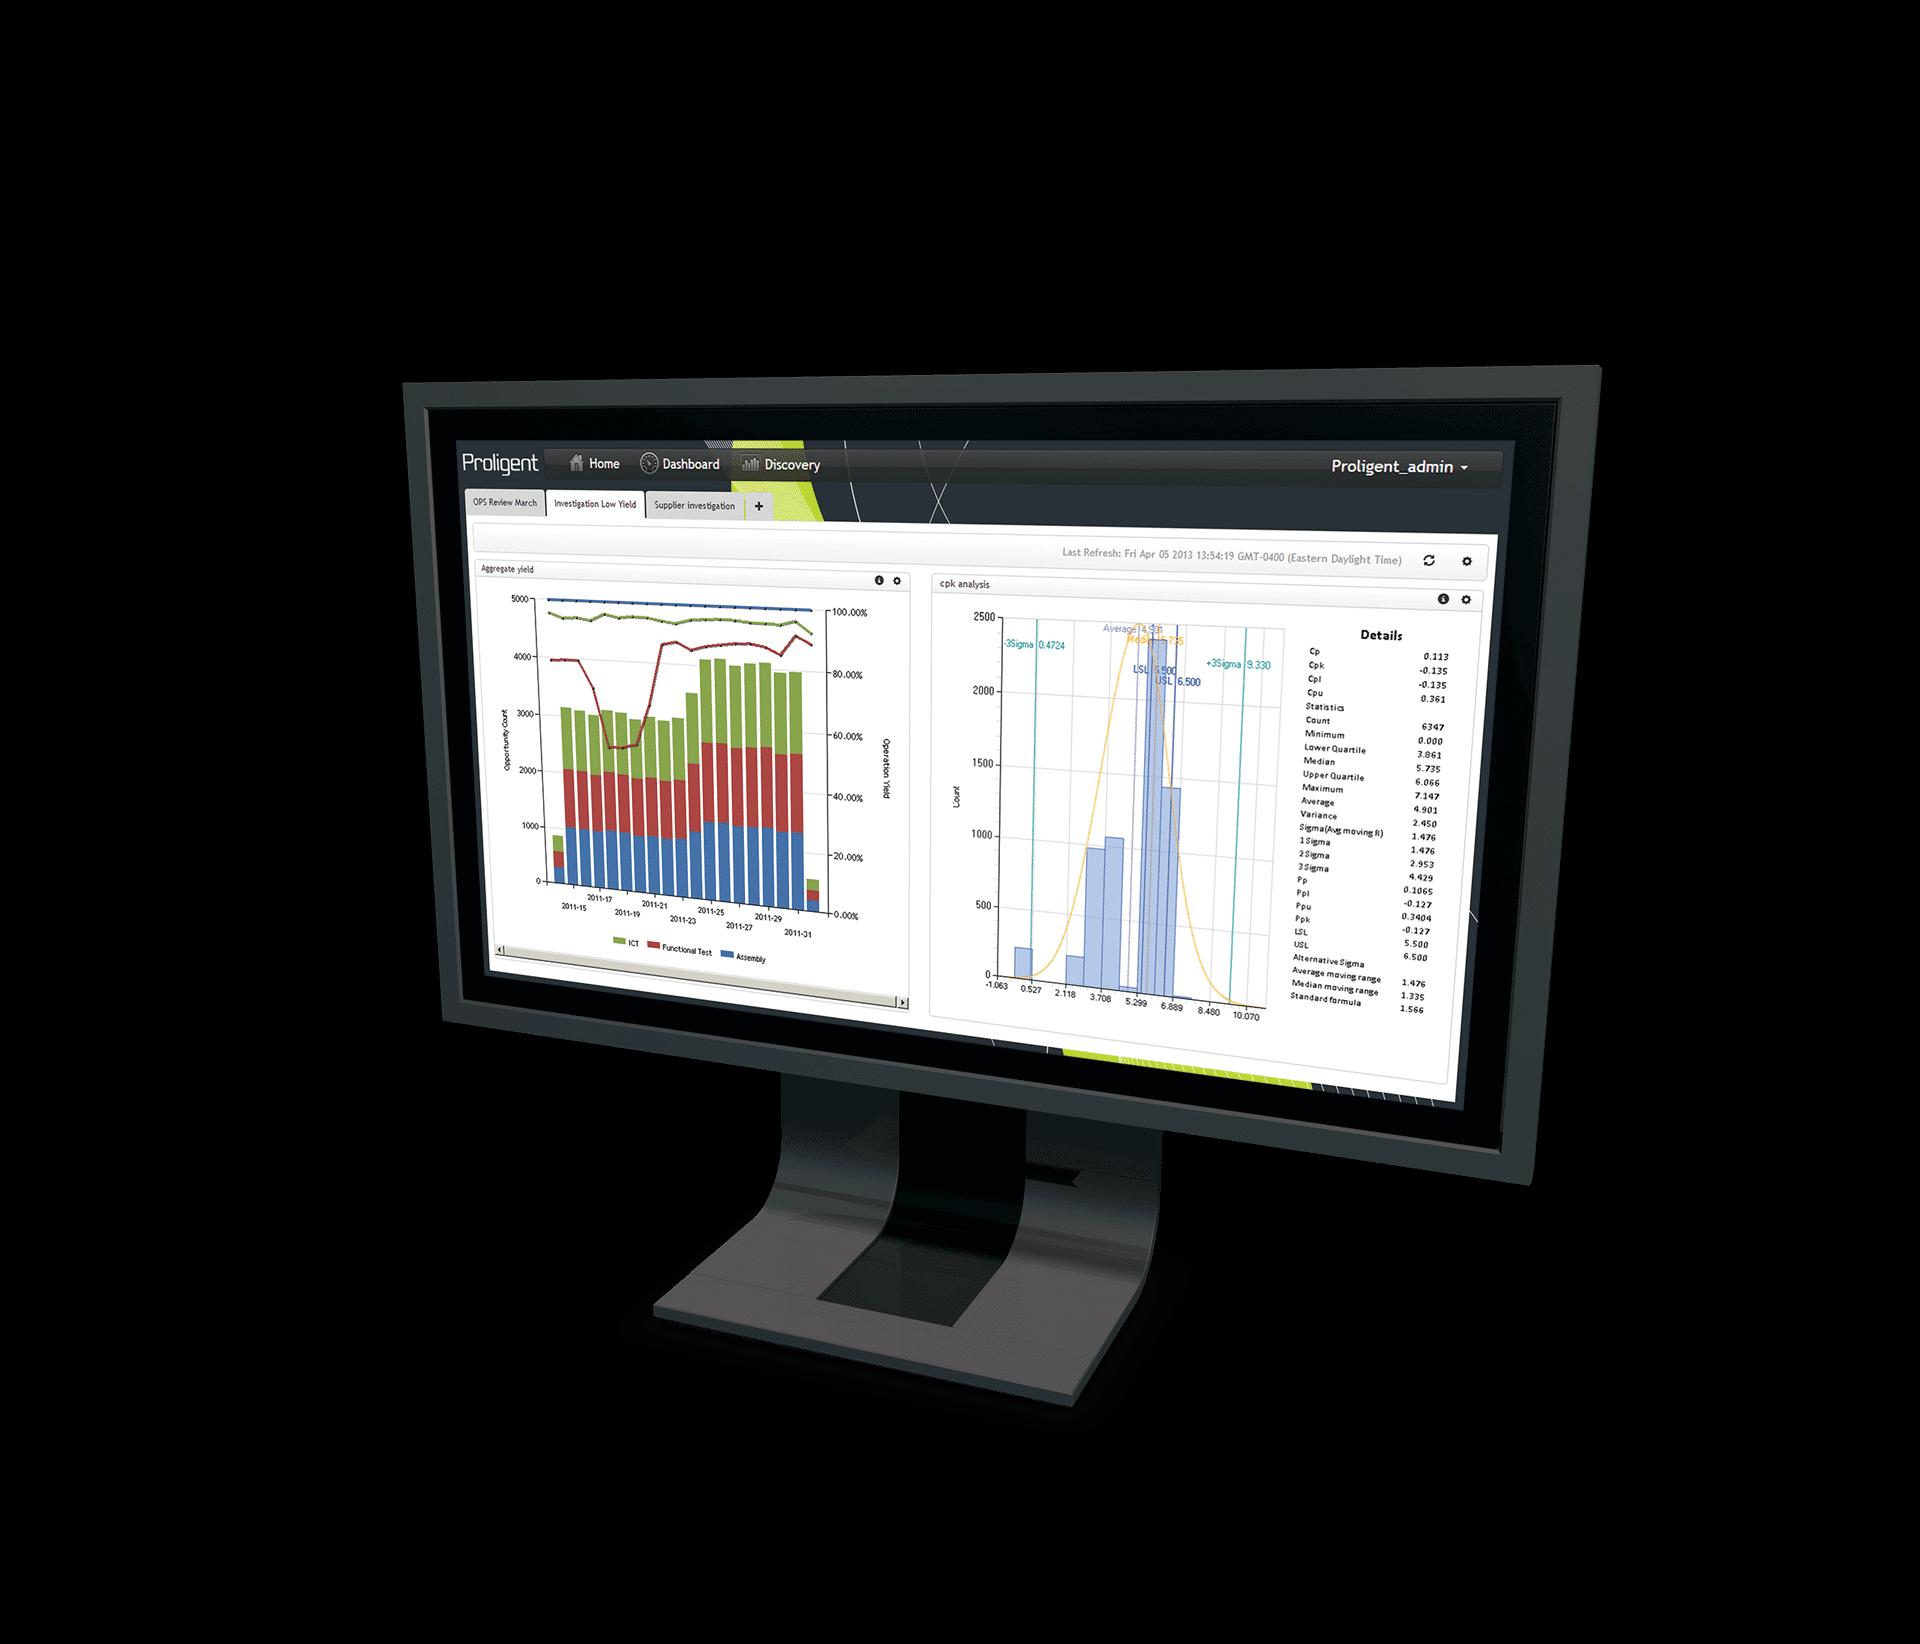 Proligent Screen Dashboard